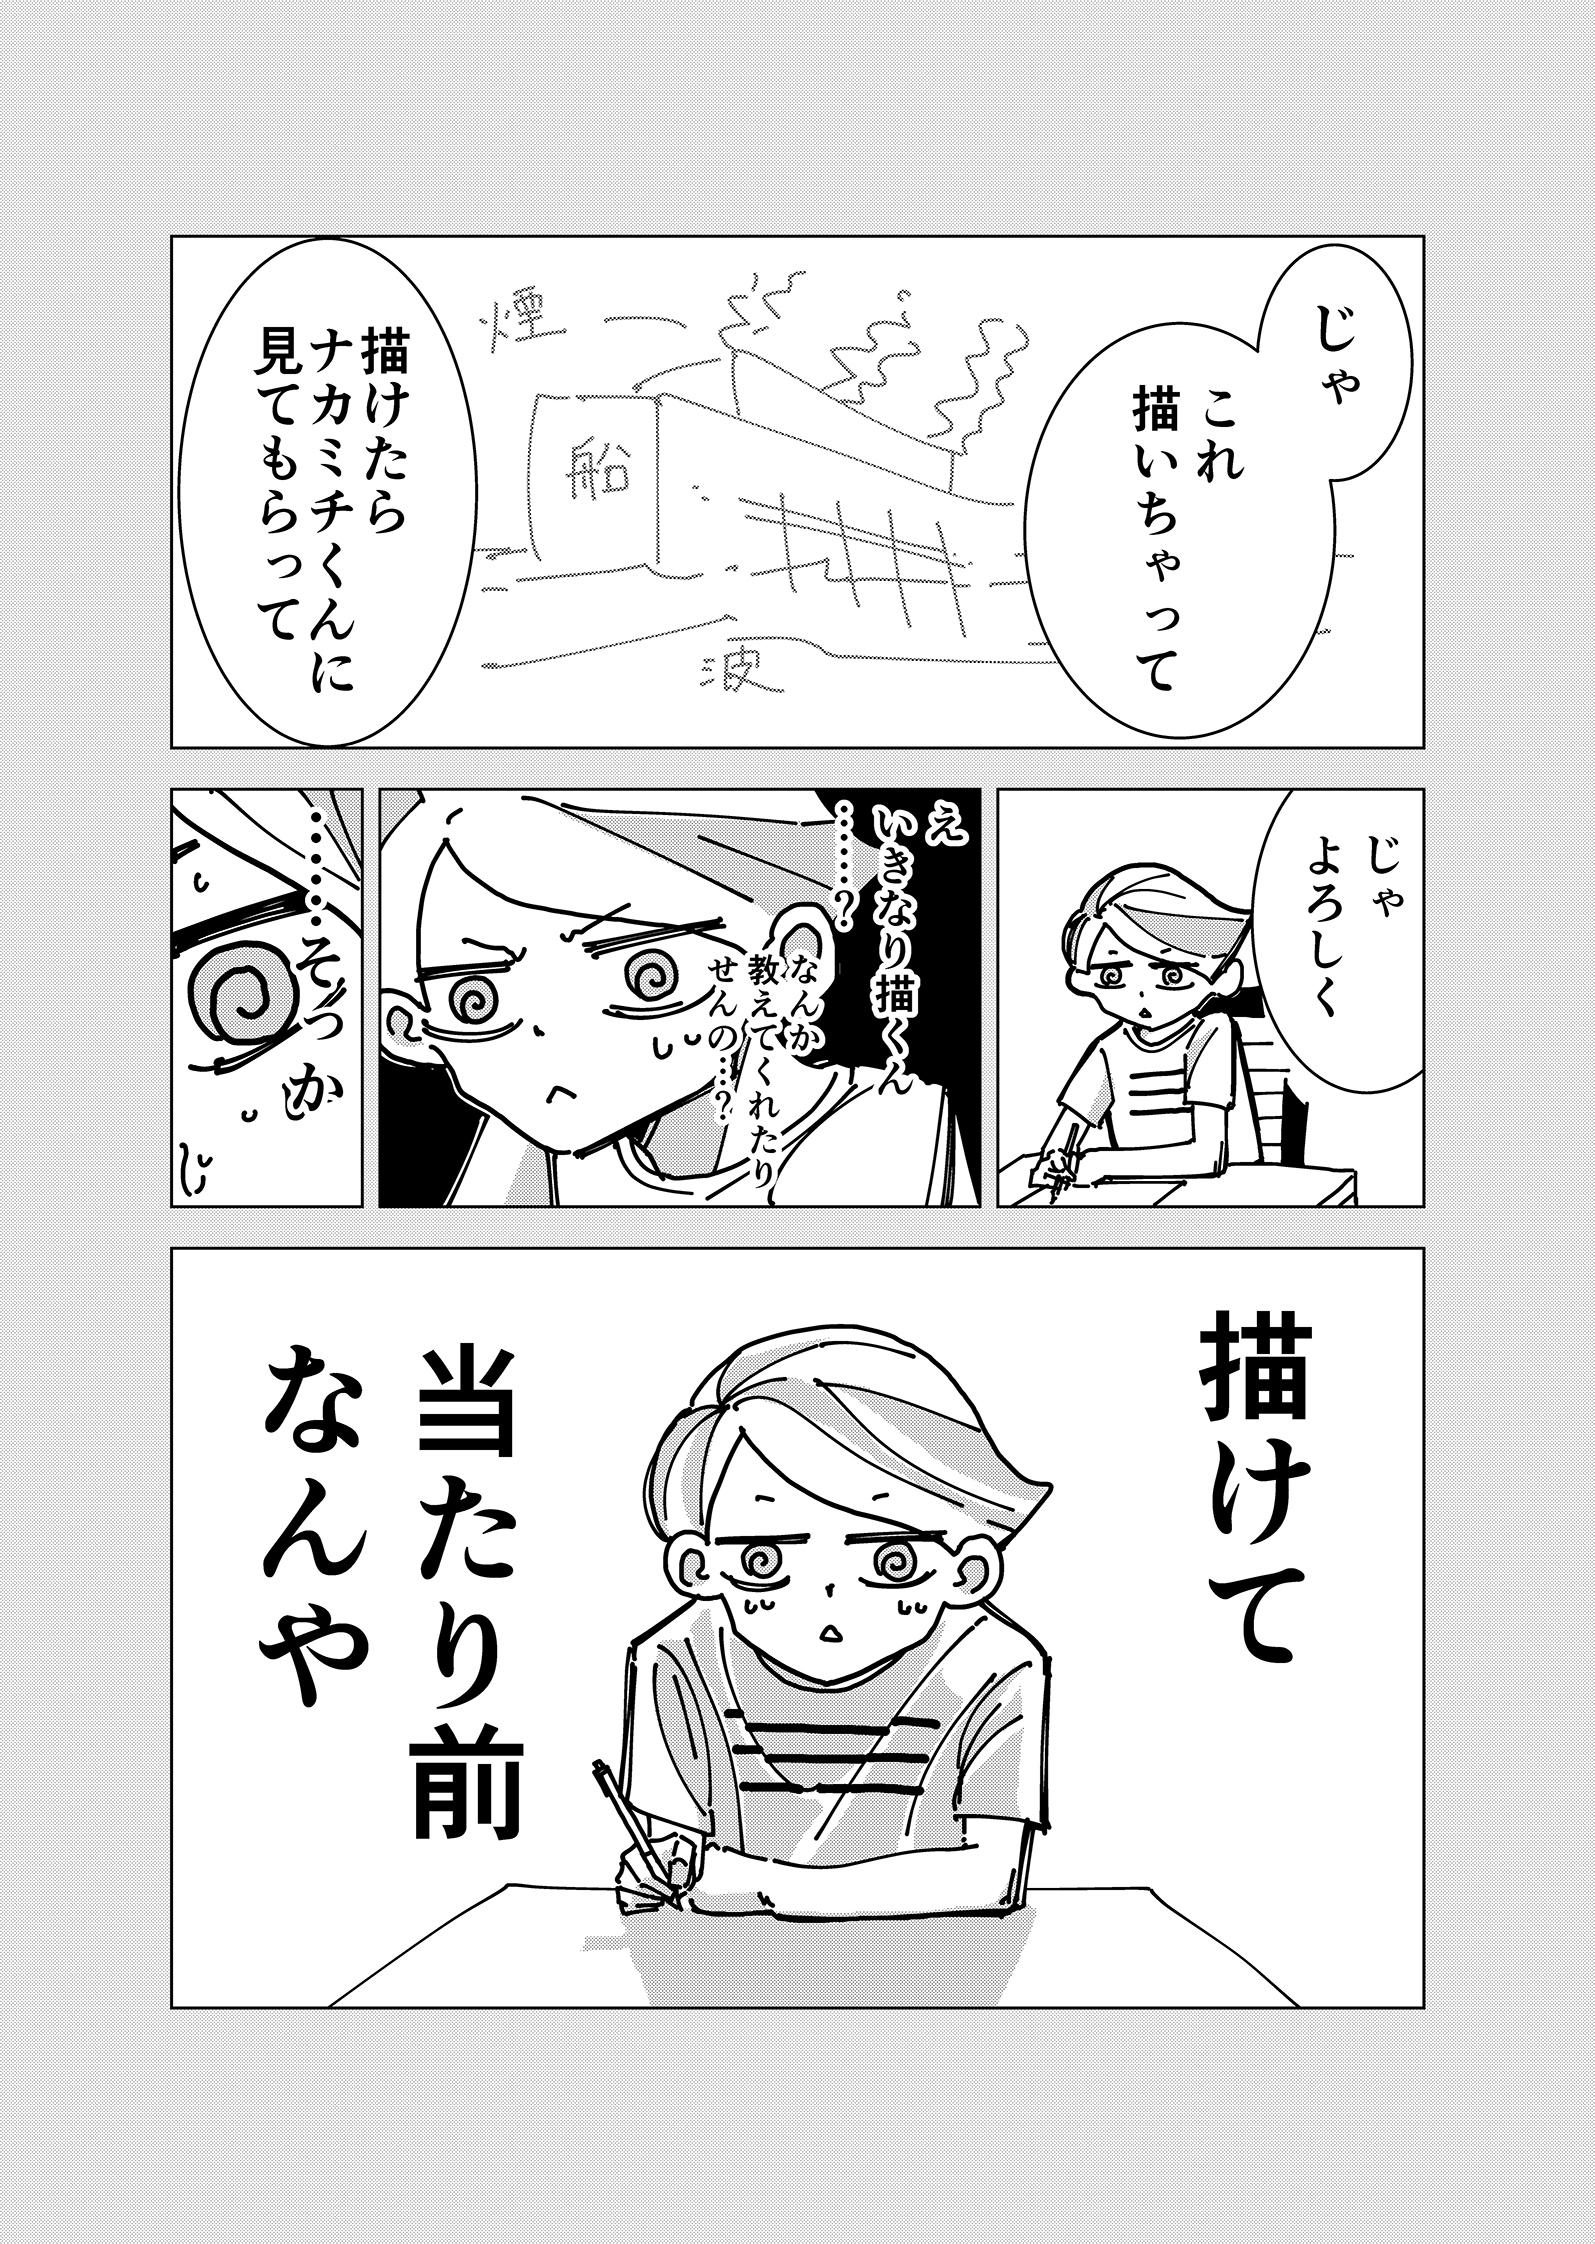 shareman01_006